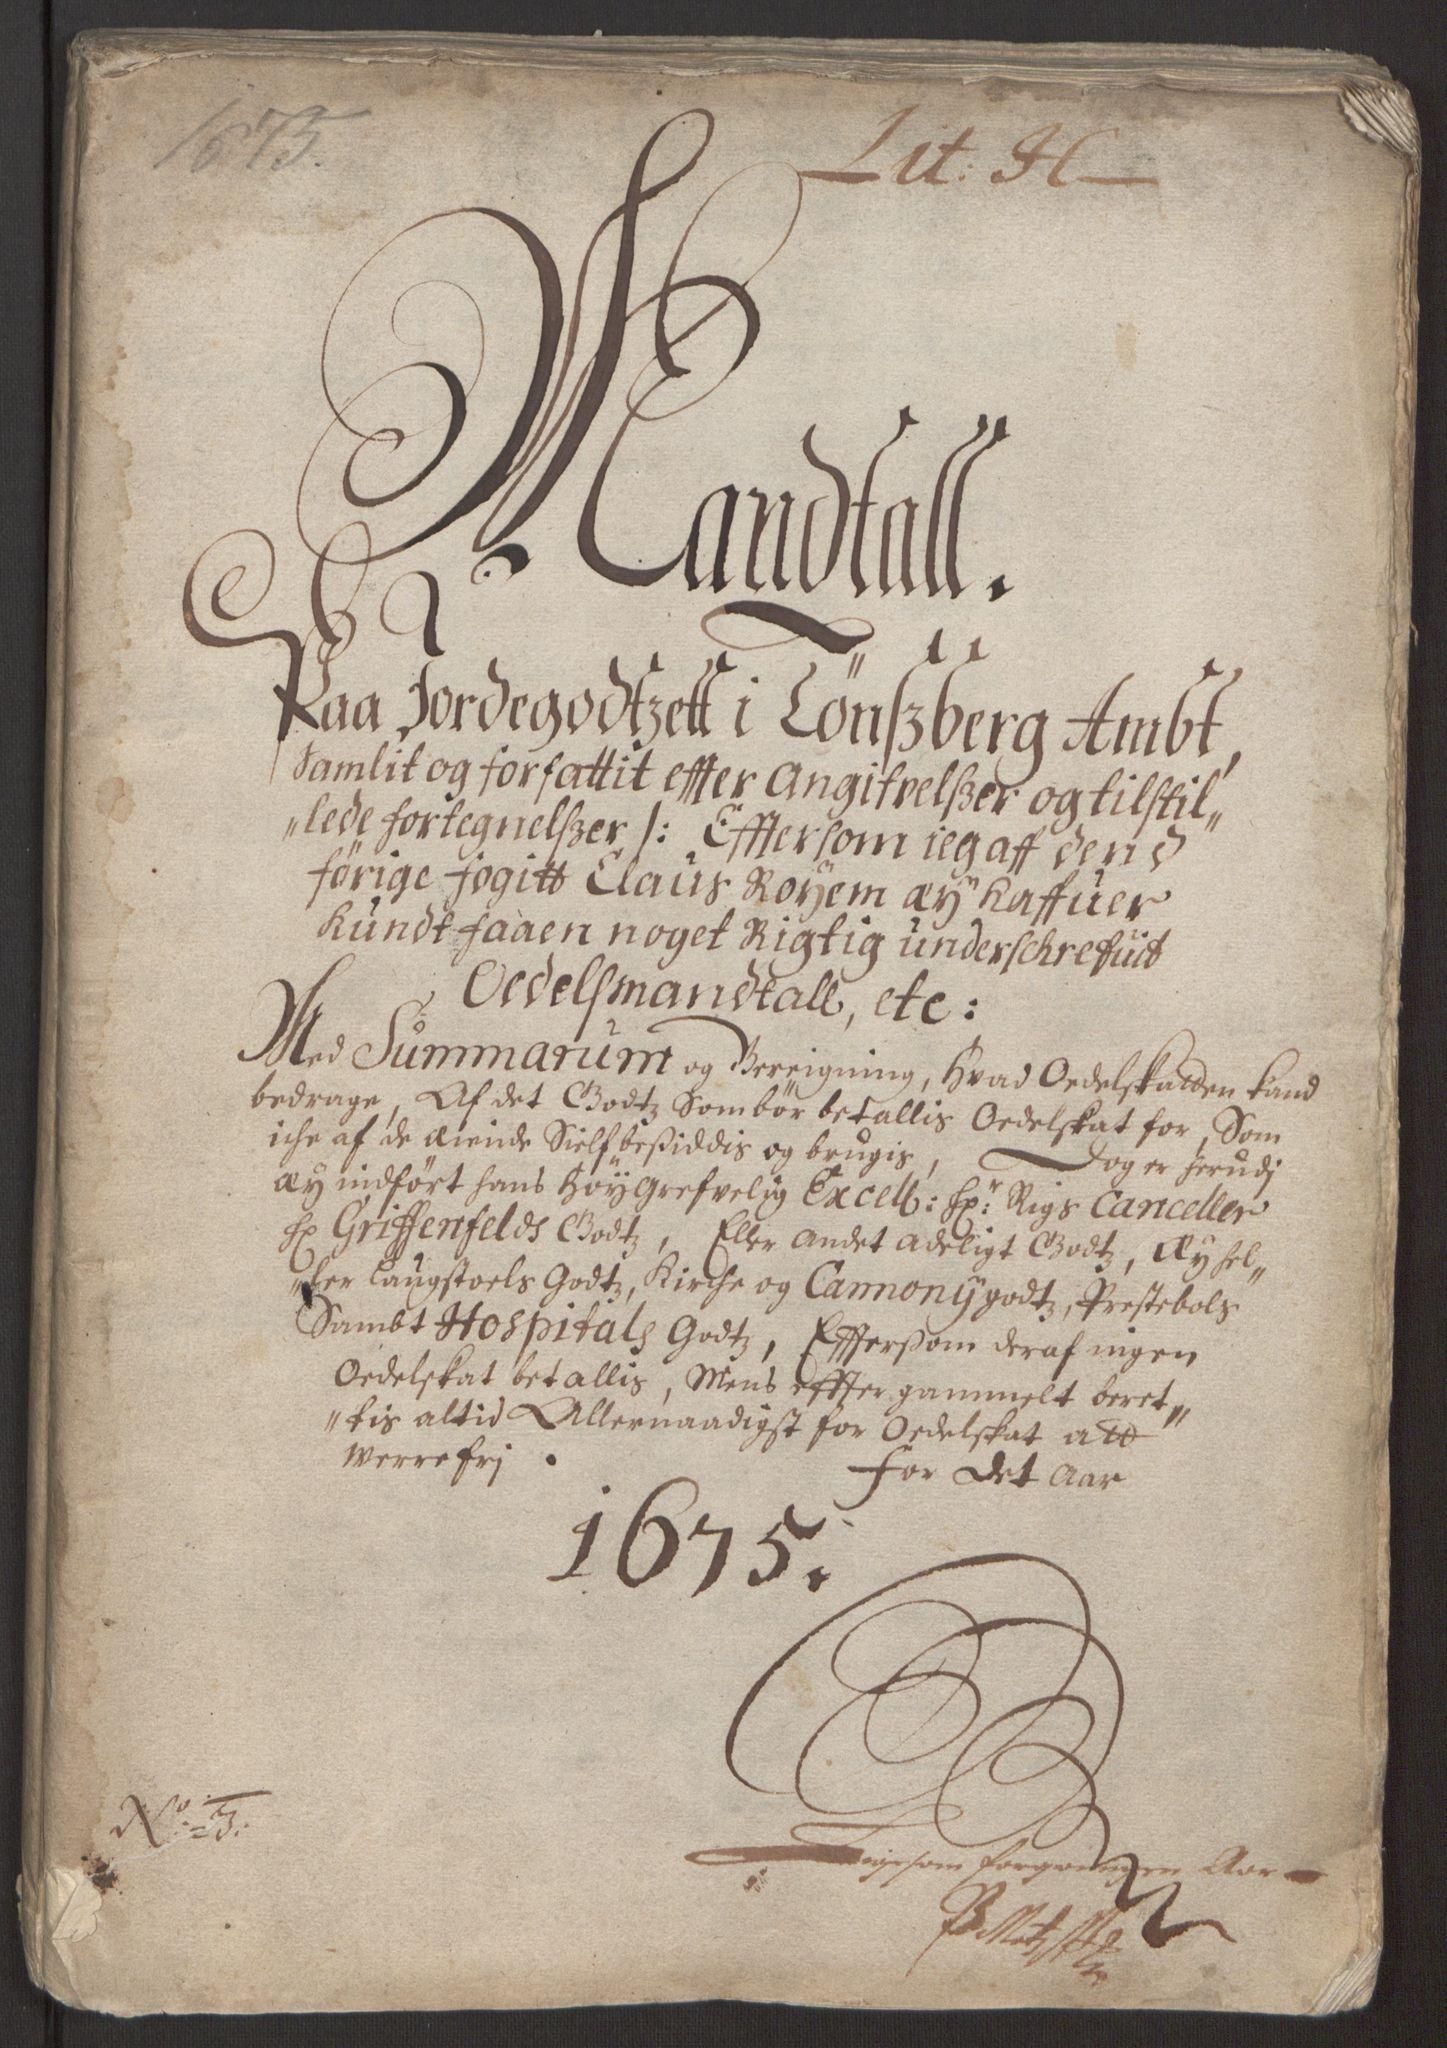 RA, Rentekammeret inntil 1814, Reviderte regnskaper, Fogderegnskap, R32/L1843: Fogderegnskap Jarlsberg grevskap, 1674-1675, s. 197